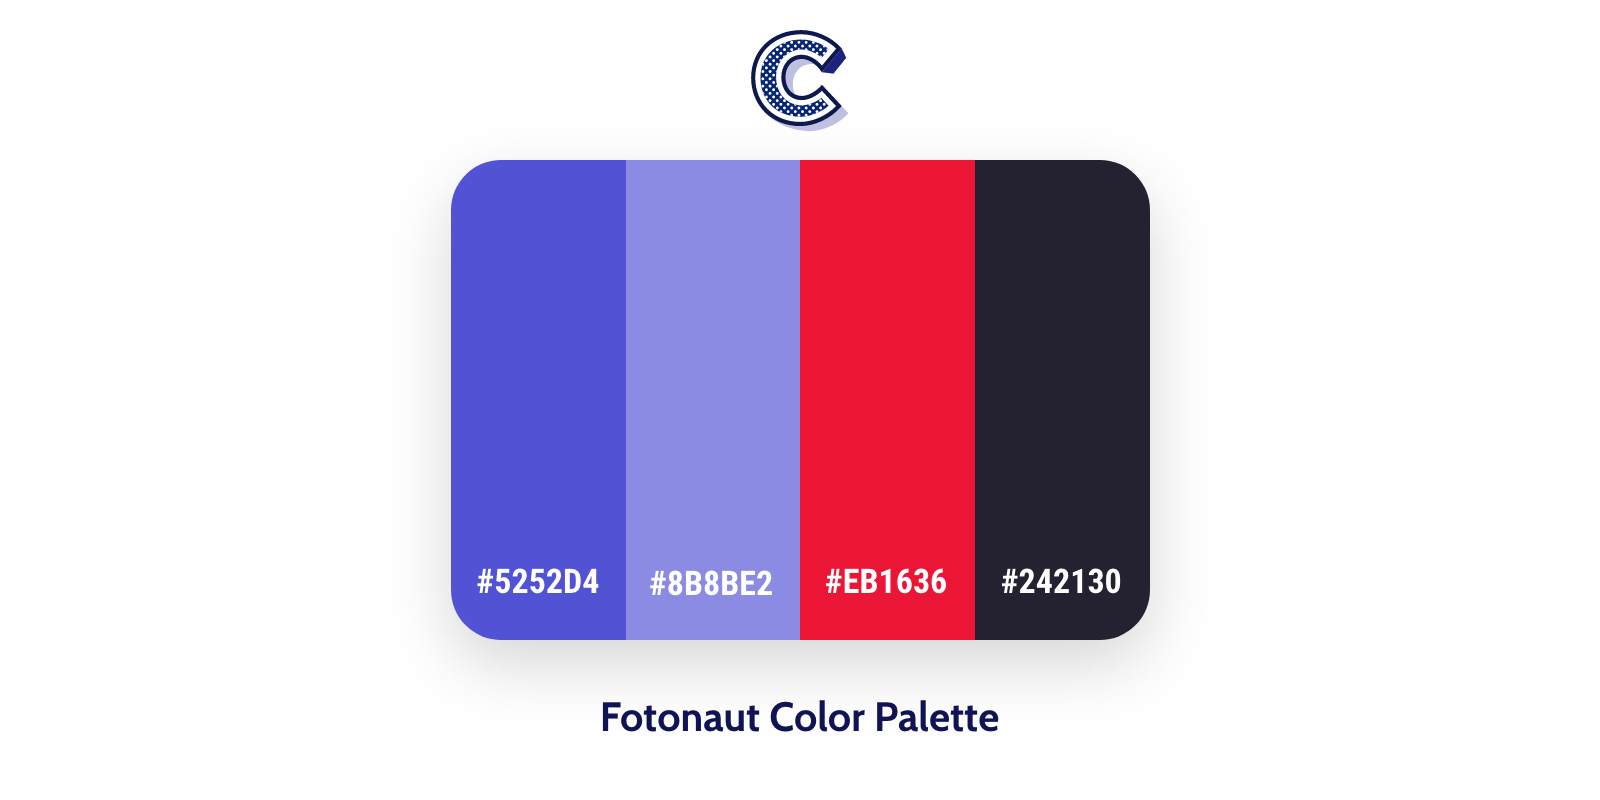 the featured image of fotonaut color palette